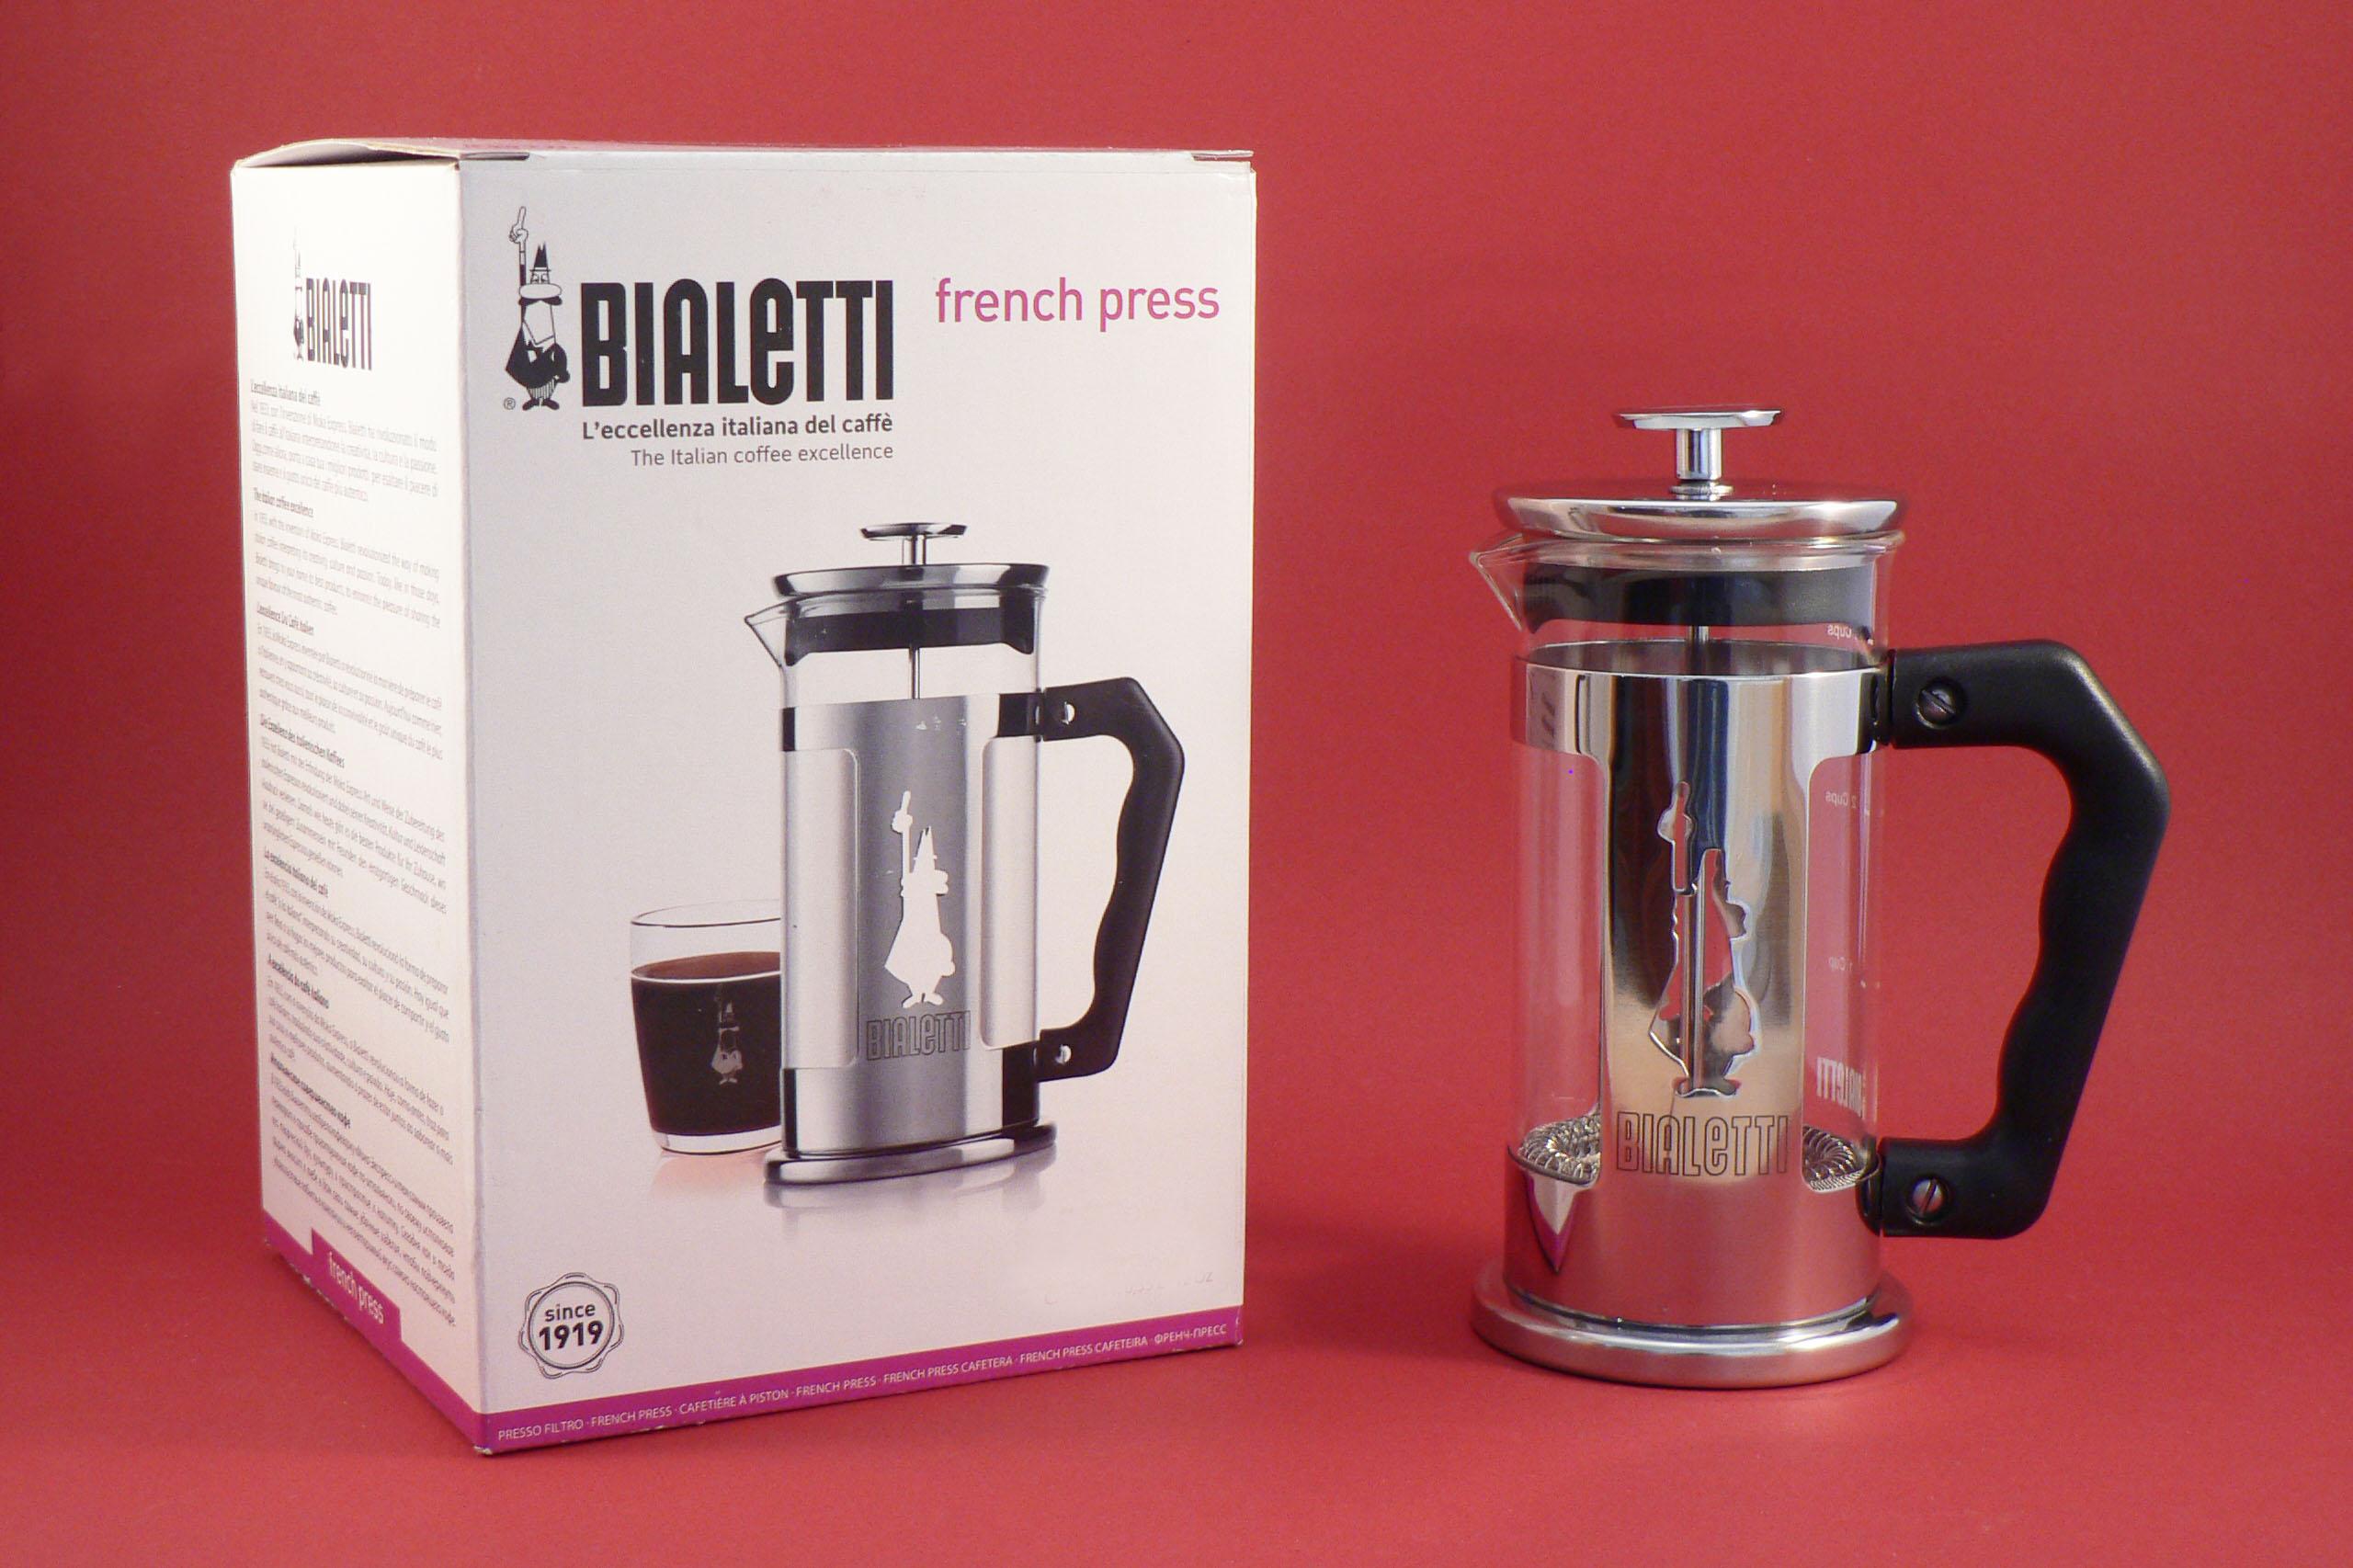 French press Bialetti panáček - 1 litr French press Bialetti panáček - 1 litr